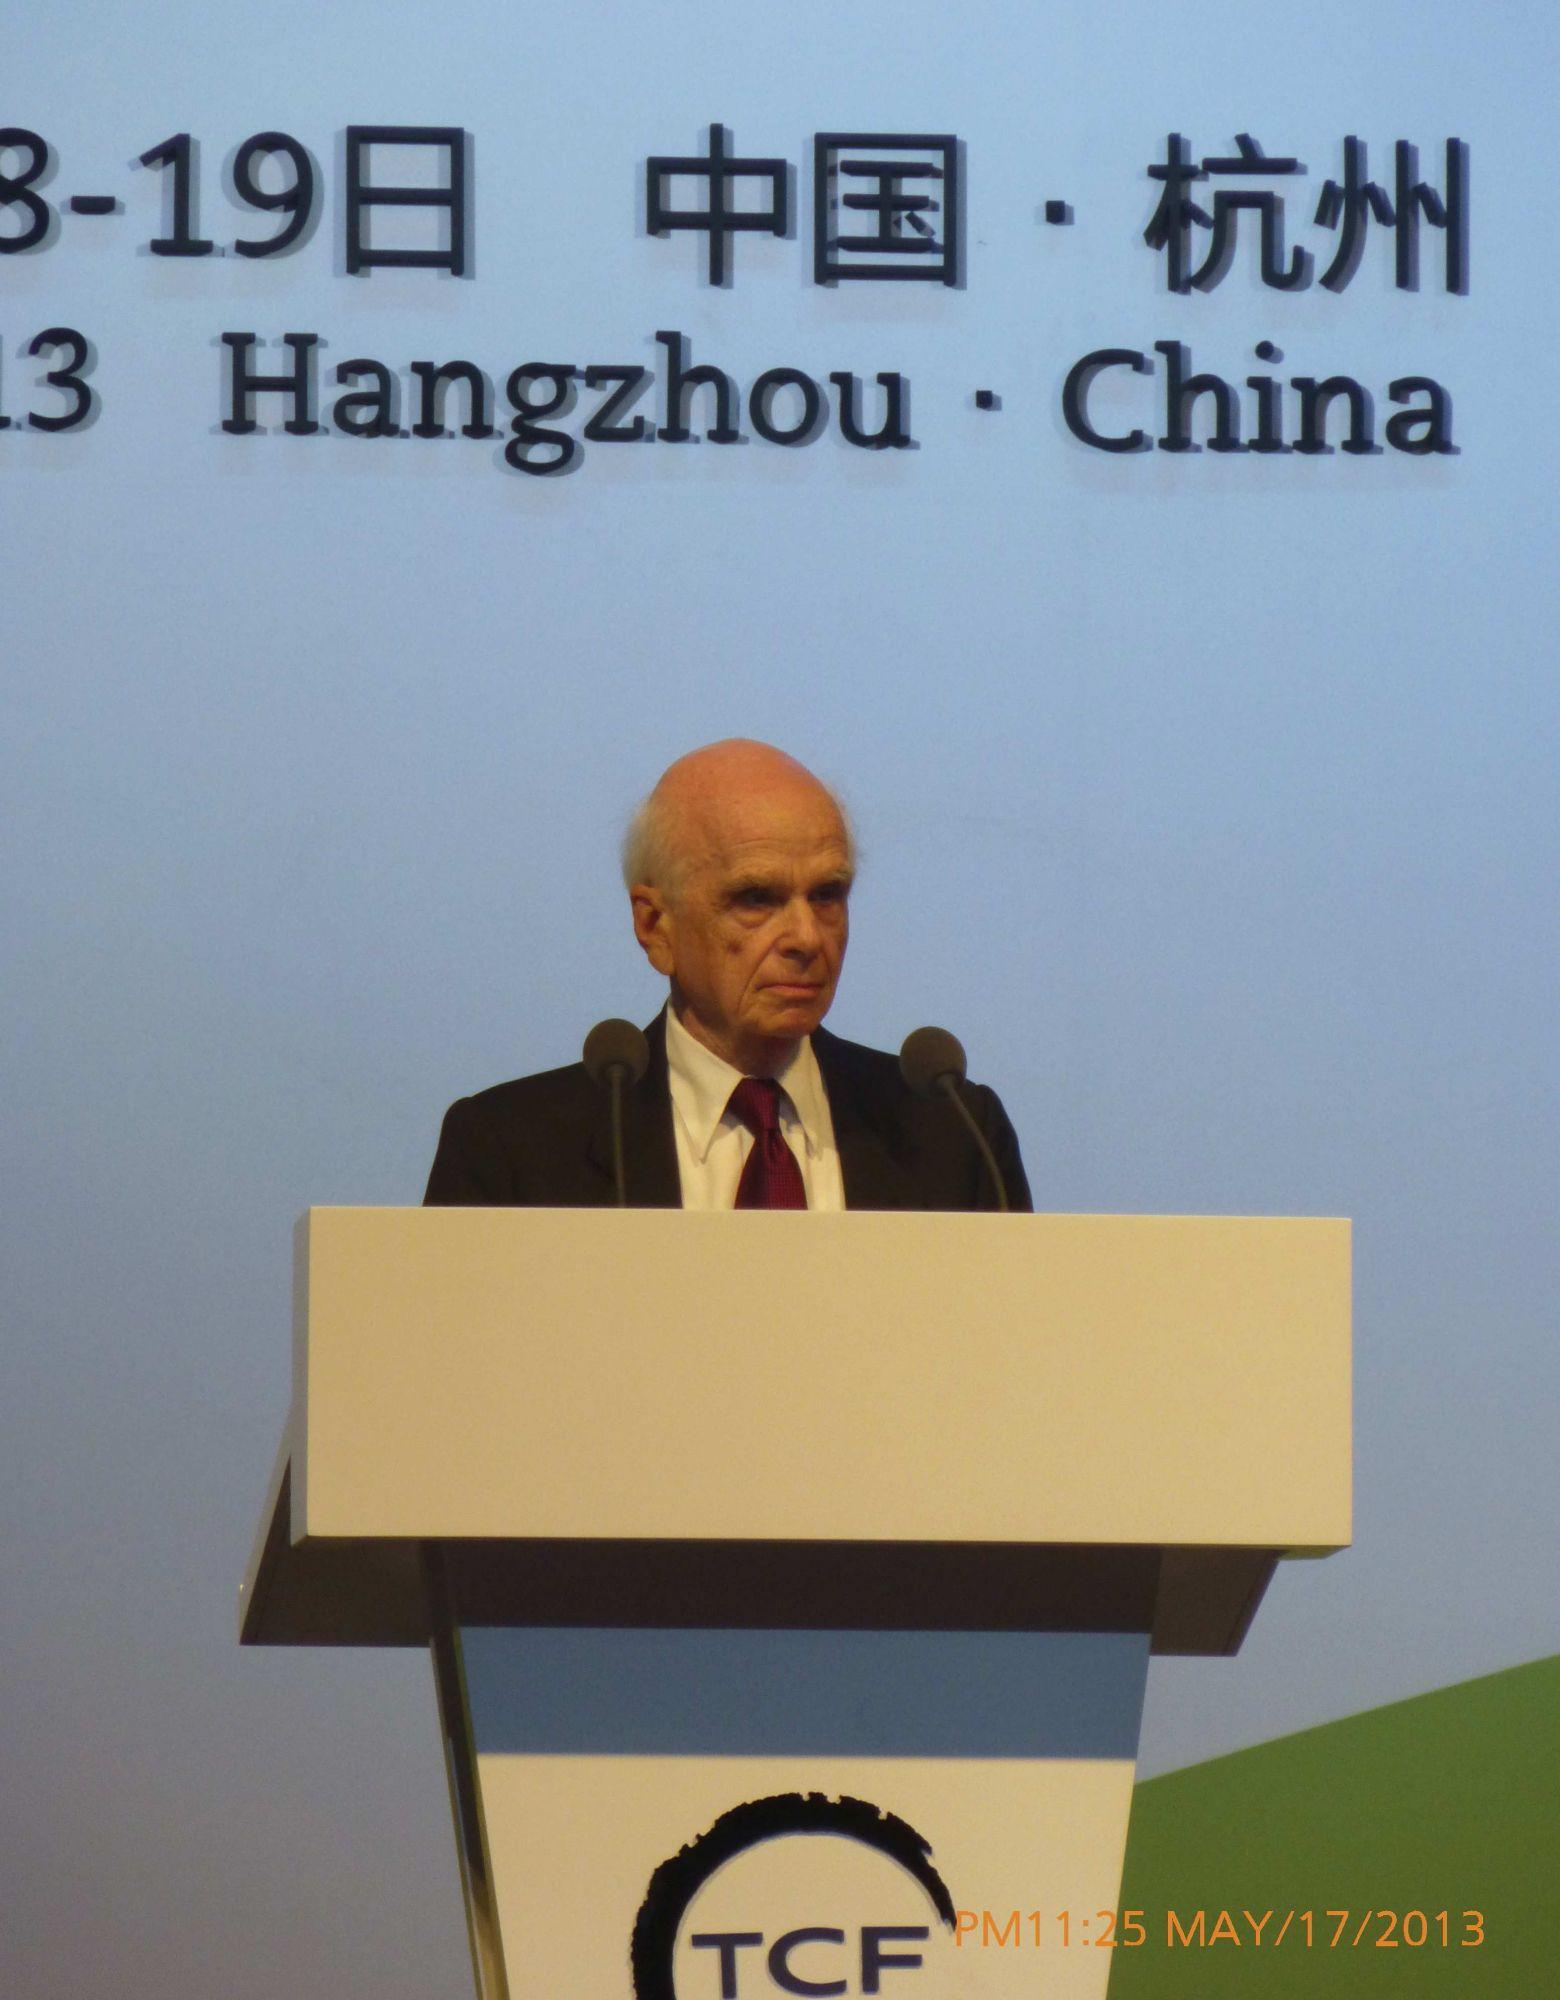 Ervin Laszlo in China 2013